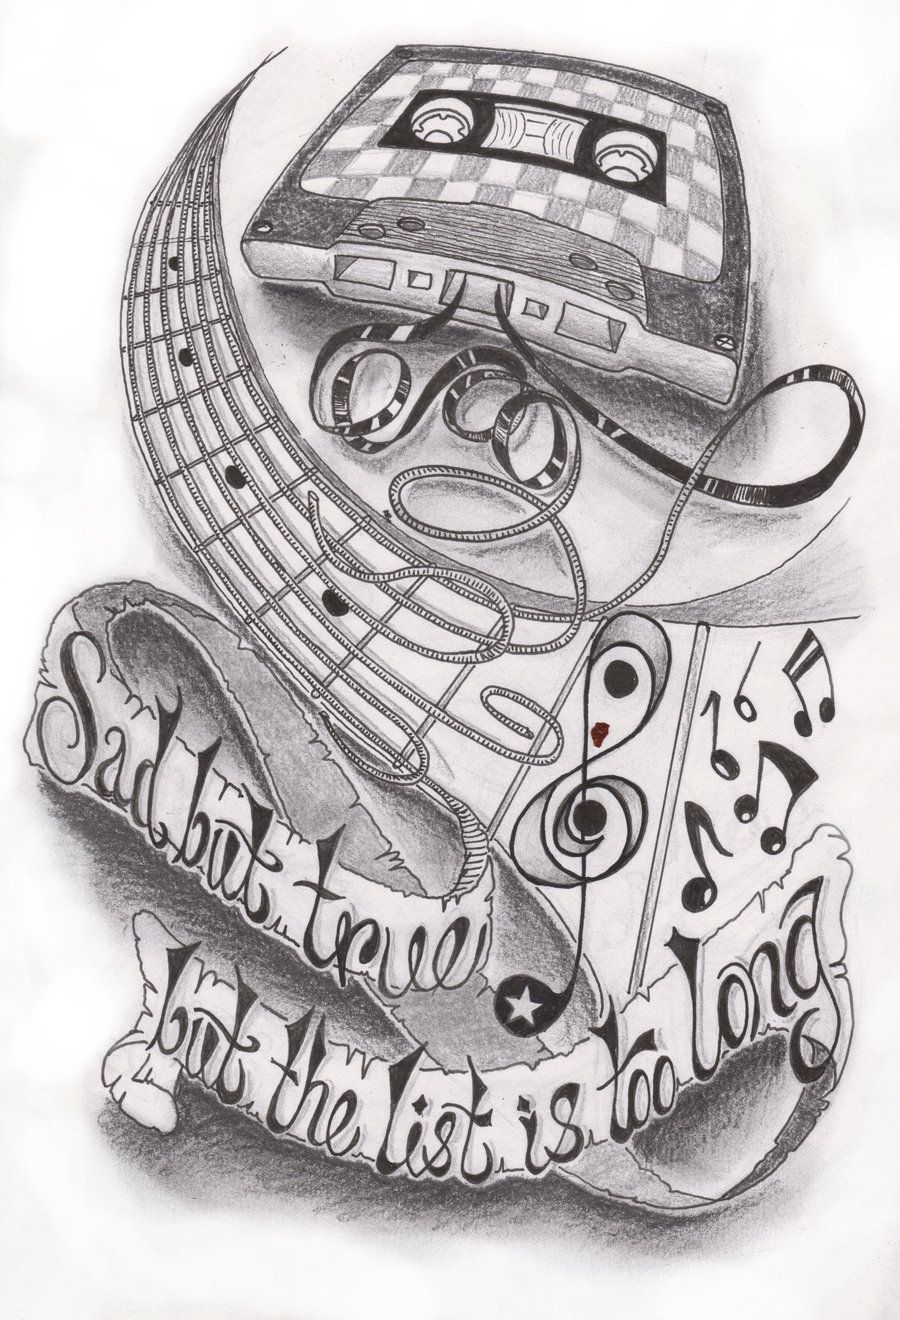 Music Half Sleeve By Dfletcher54734 On Deviantart Half Sleeve Tattoos Sketches Music Tattoo Sleeves Half Sleeve Tattoos Designs